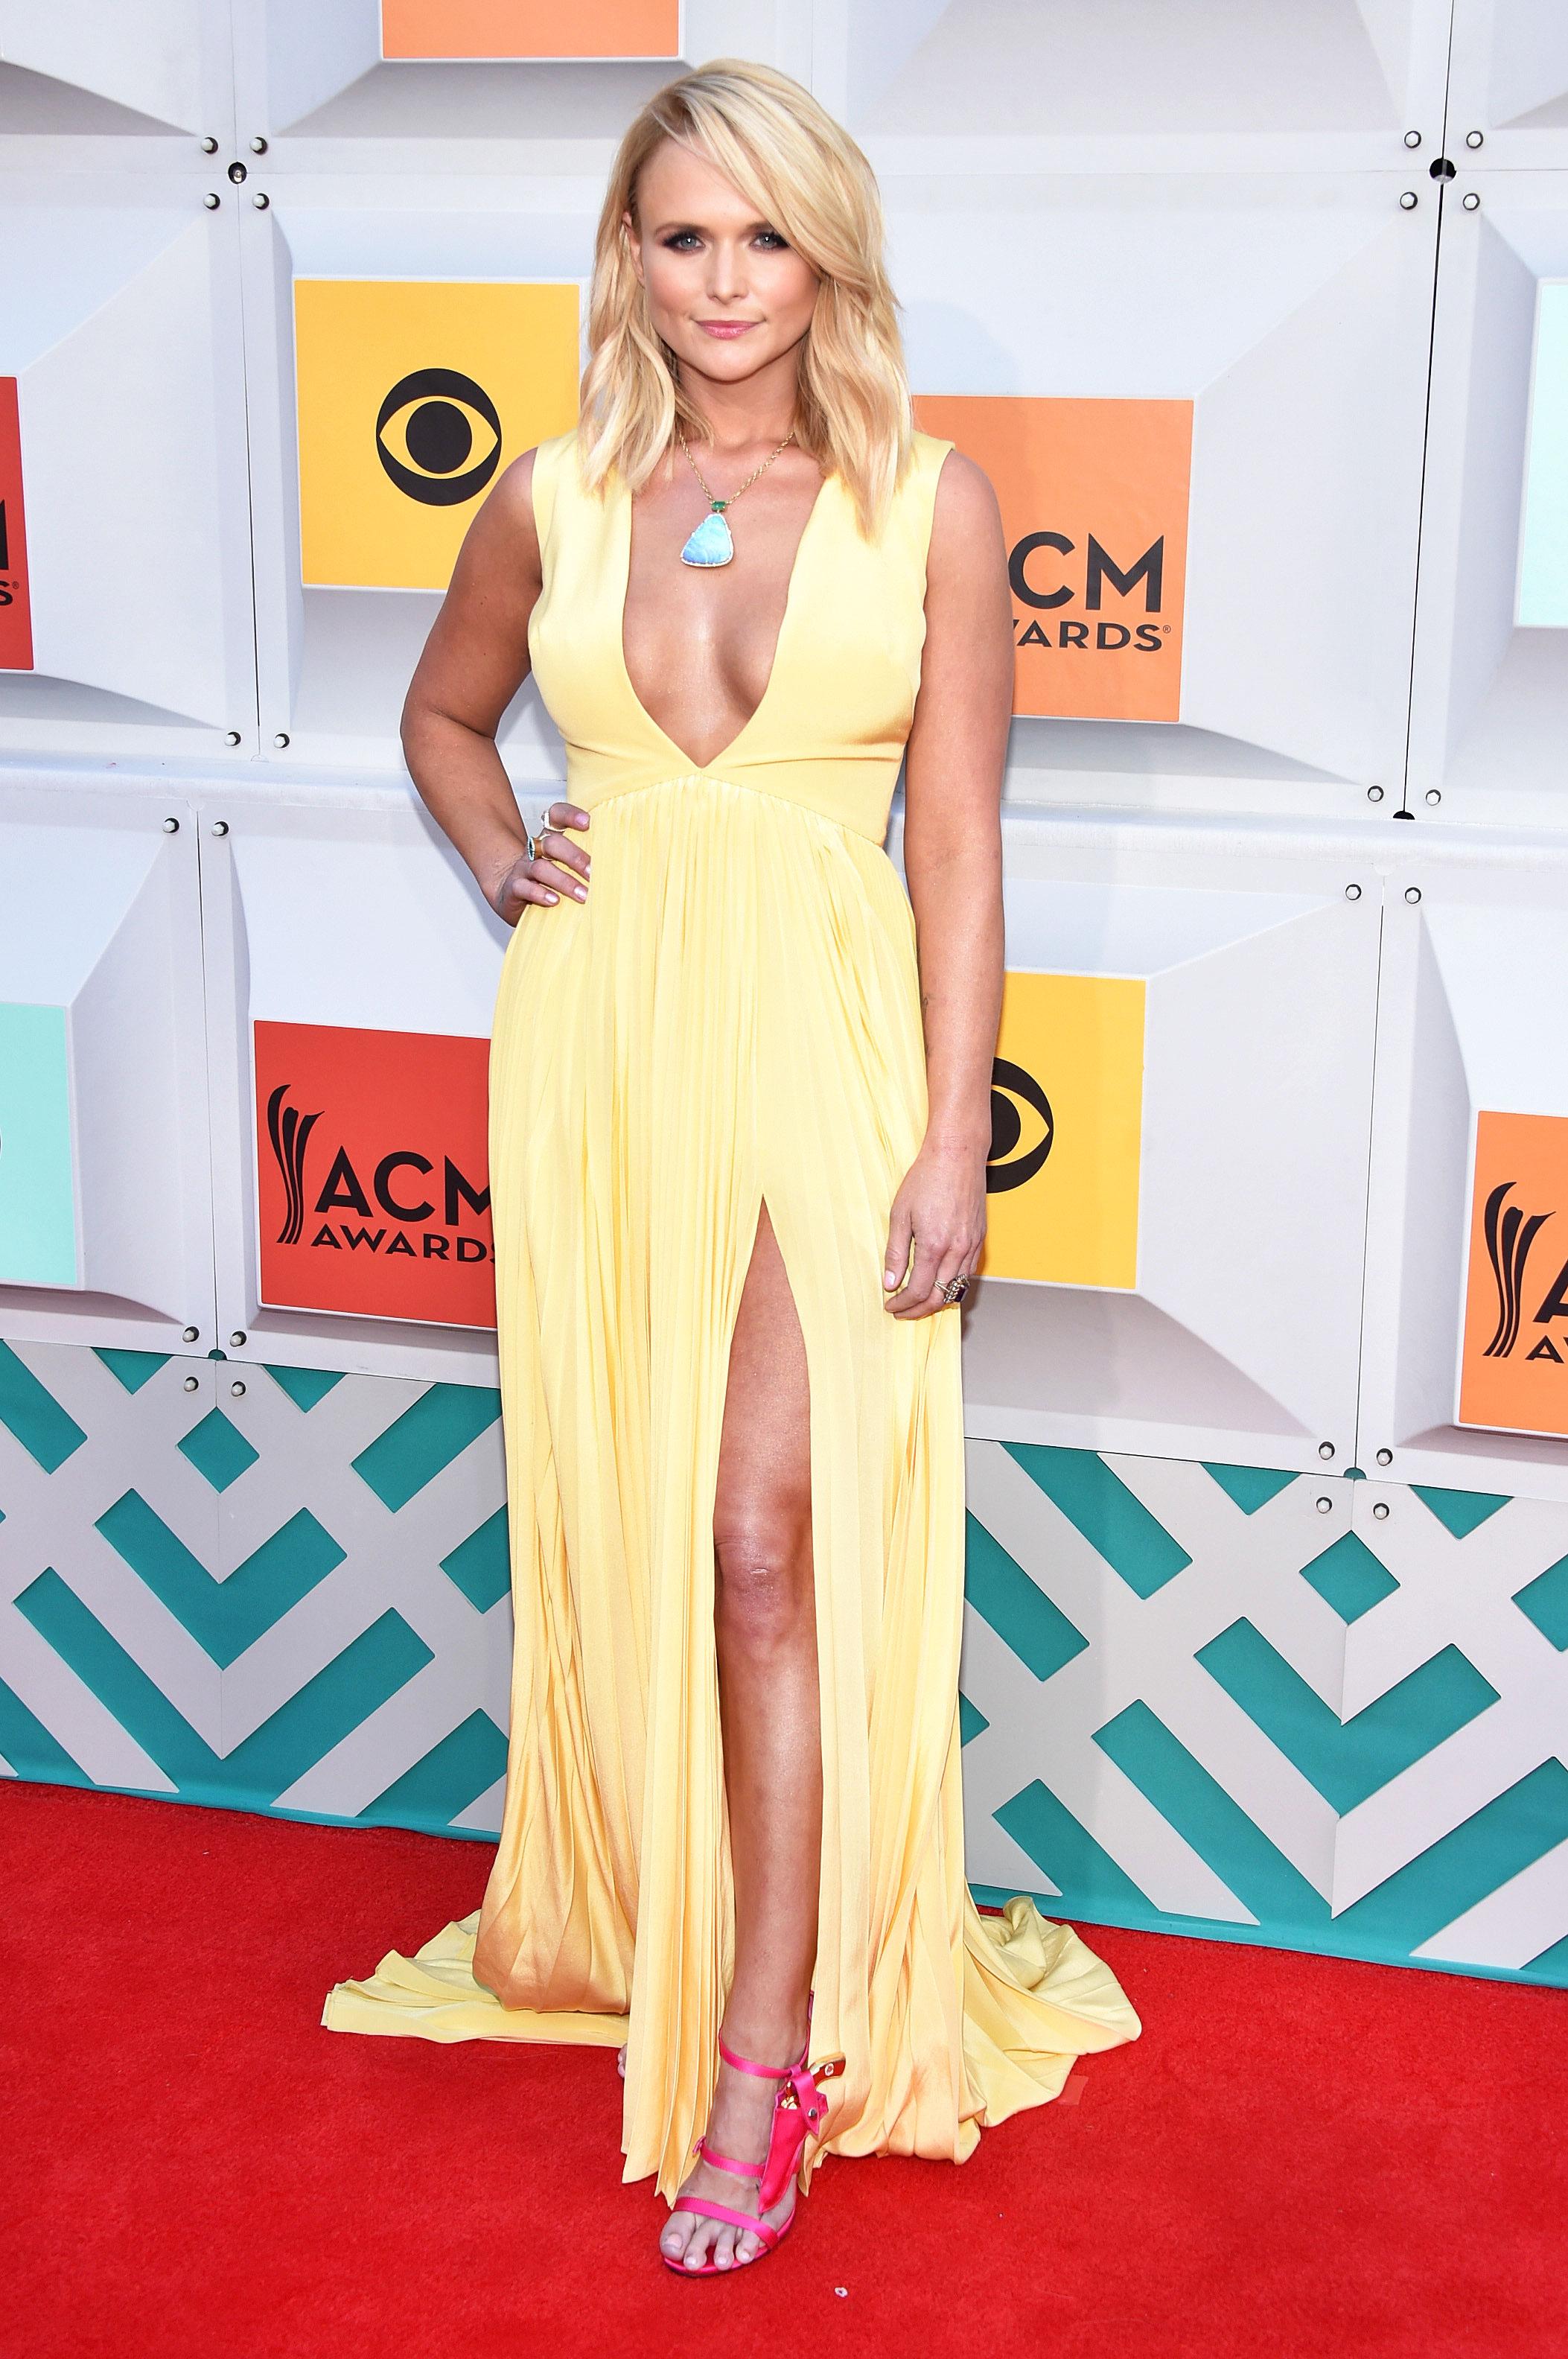 Miranda Lambert\'s Gun Holster Heels at the ACM Awards 2016: Details